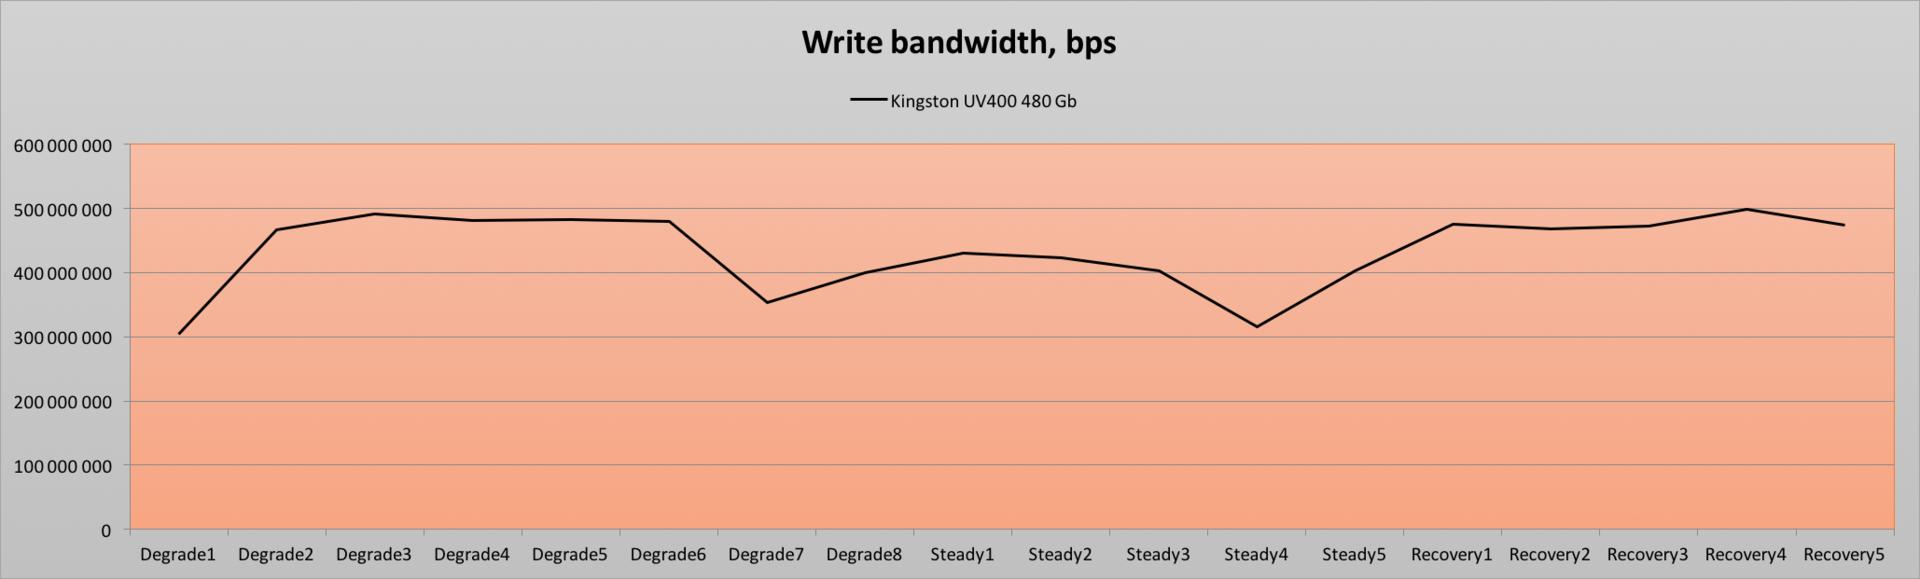 Обзор твердотельного накопителя Kingston UV400 480 Gb — SSD с «изюмом» - 17